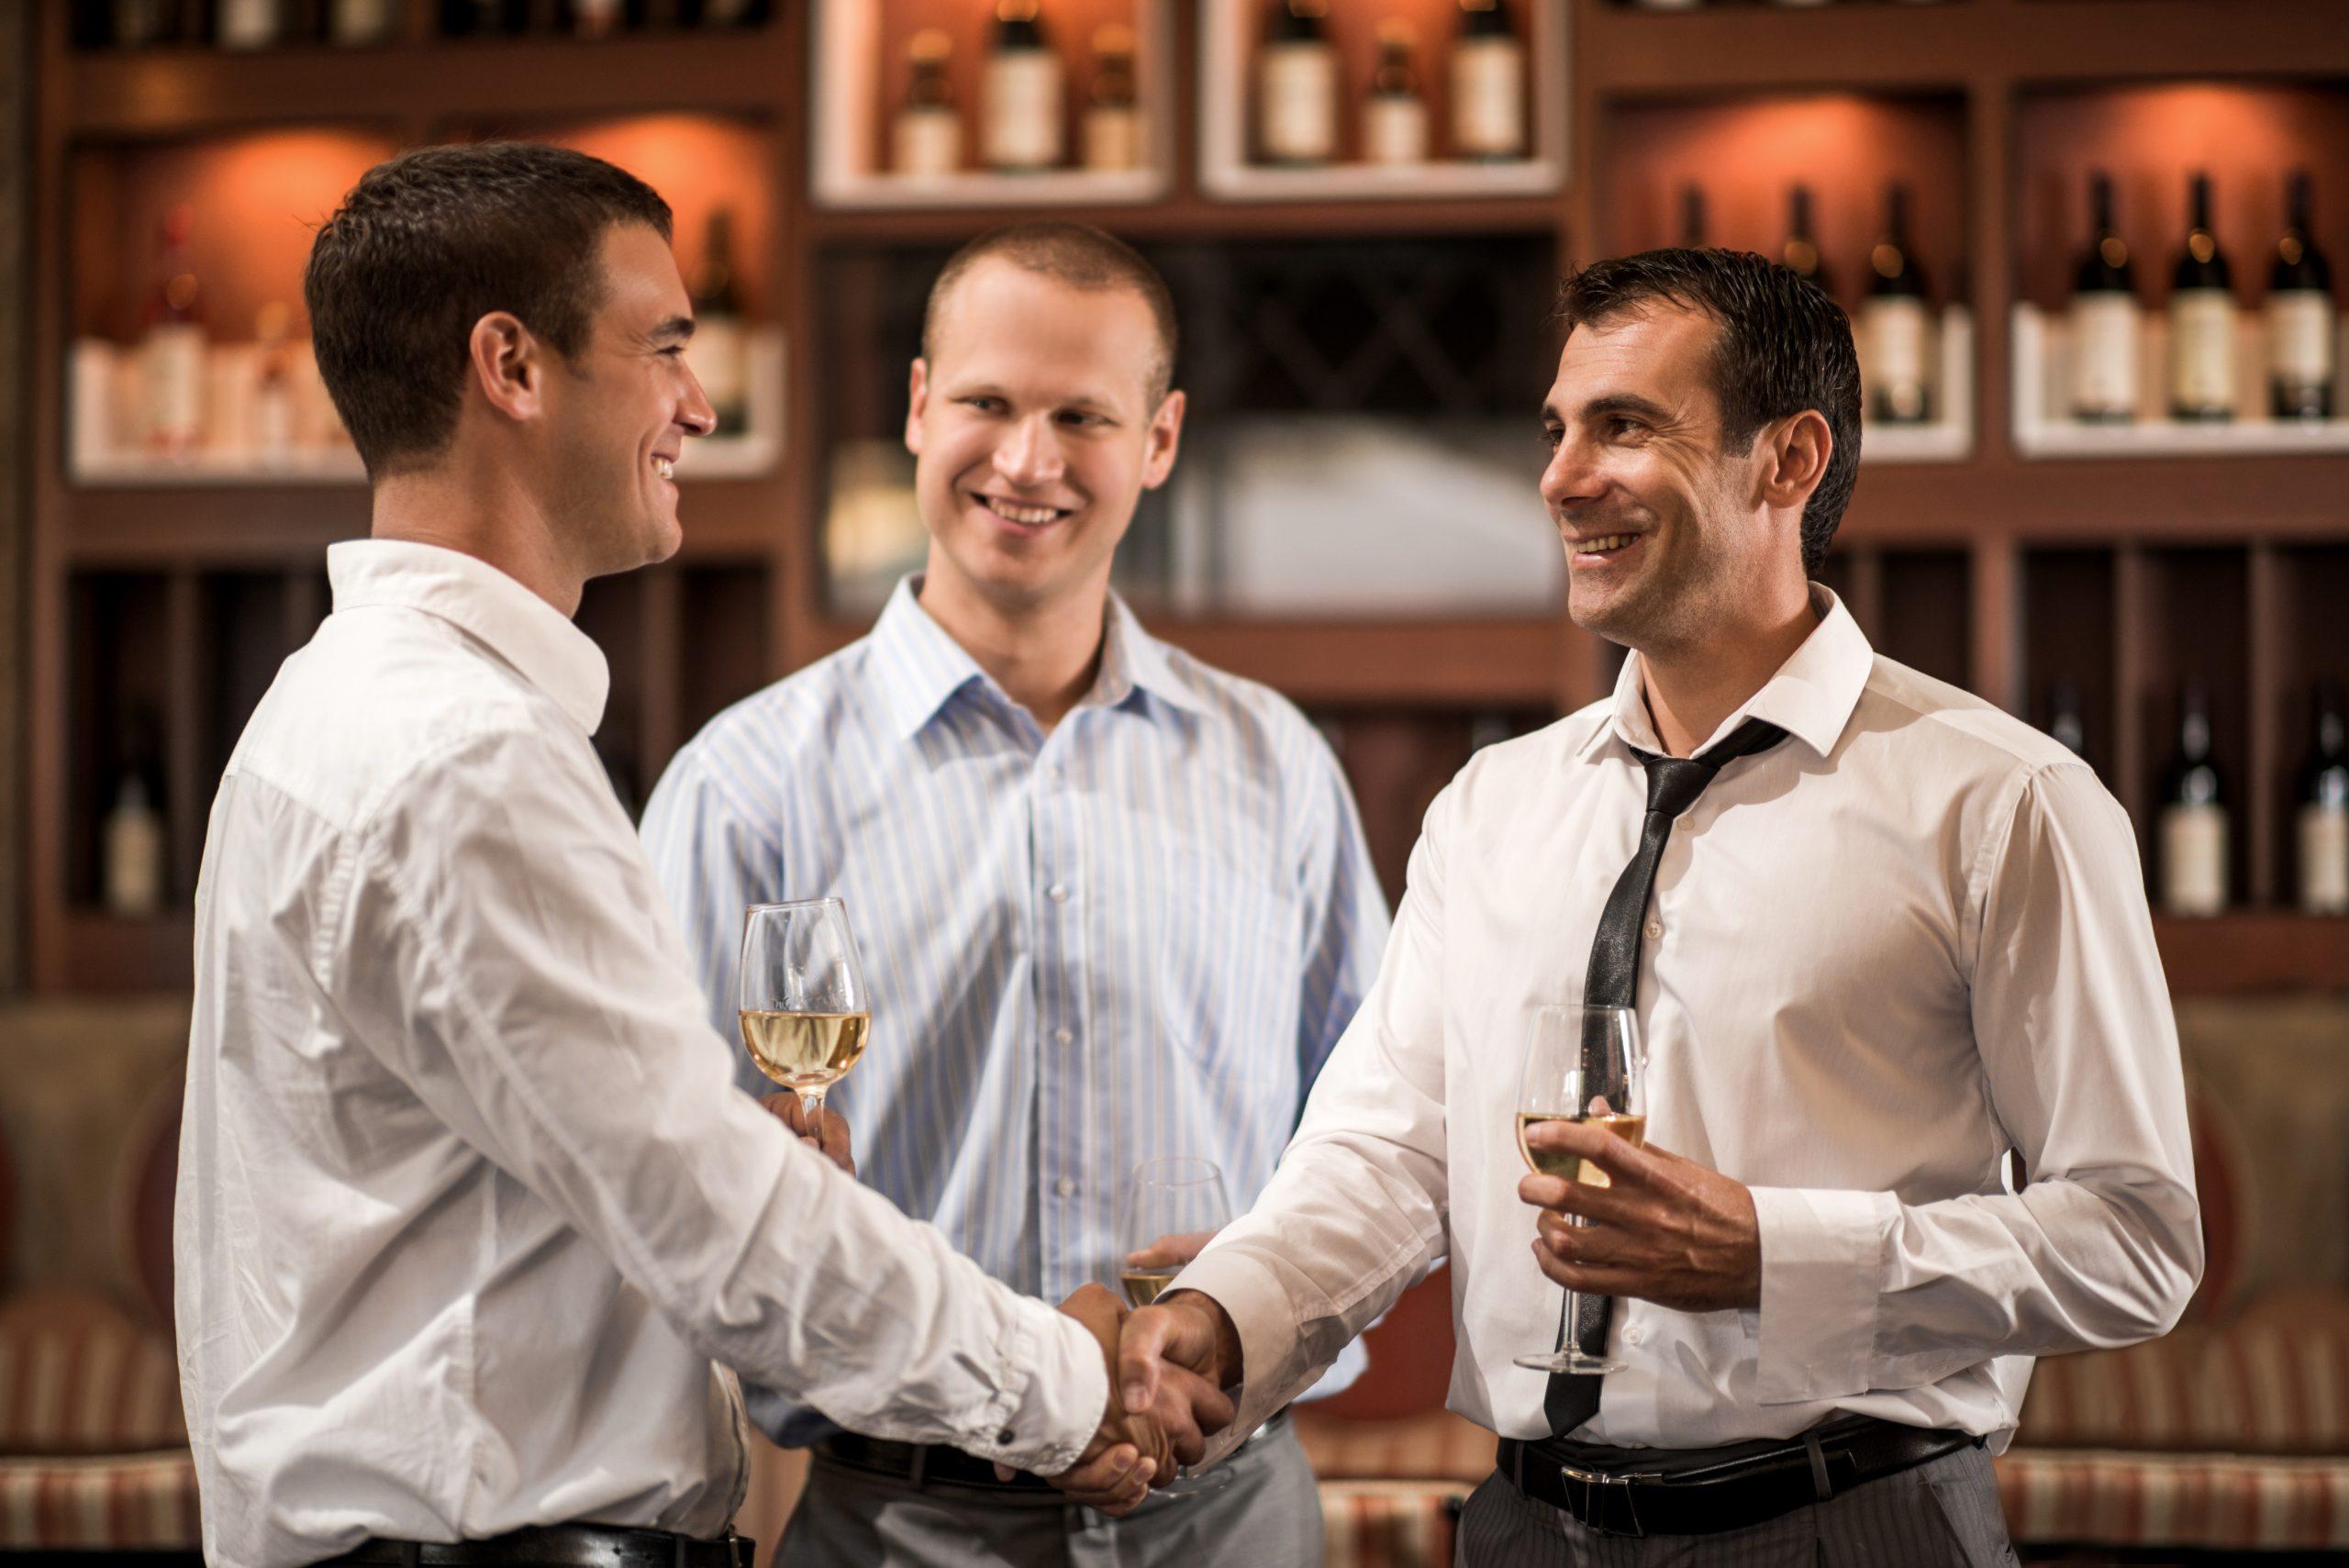 businessmen shaking hands: vinexposium boosts drinks trade with eventful season ahead